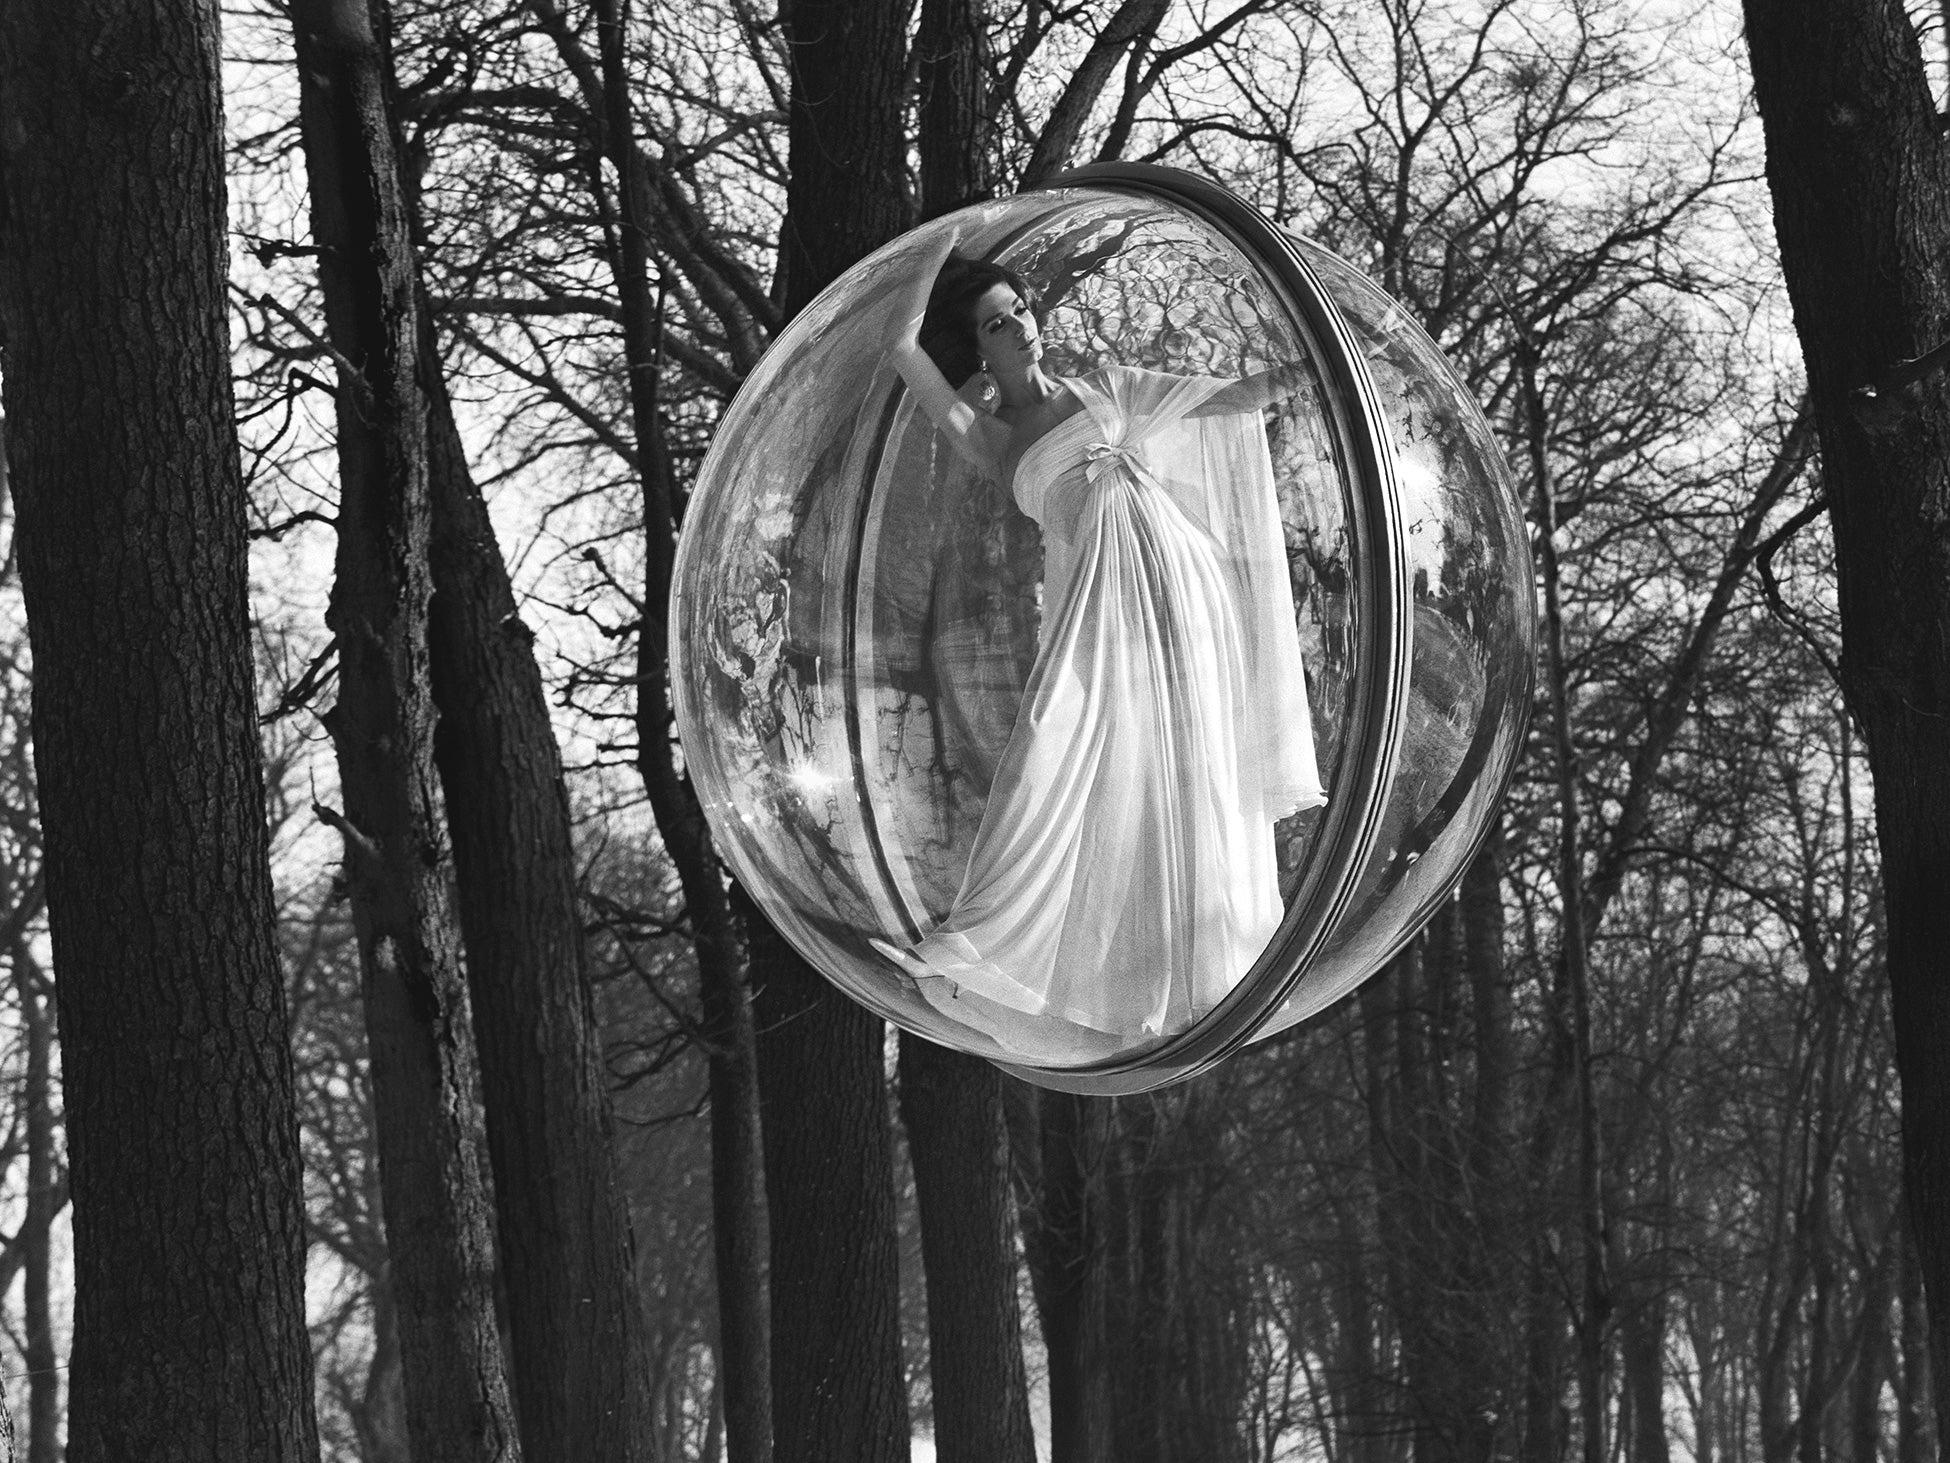 Melvin Sokolsky's Iconic Fashion Bubbles